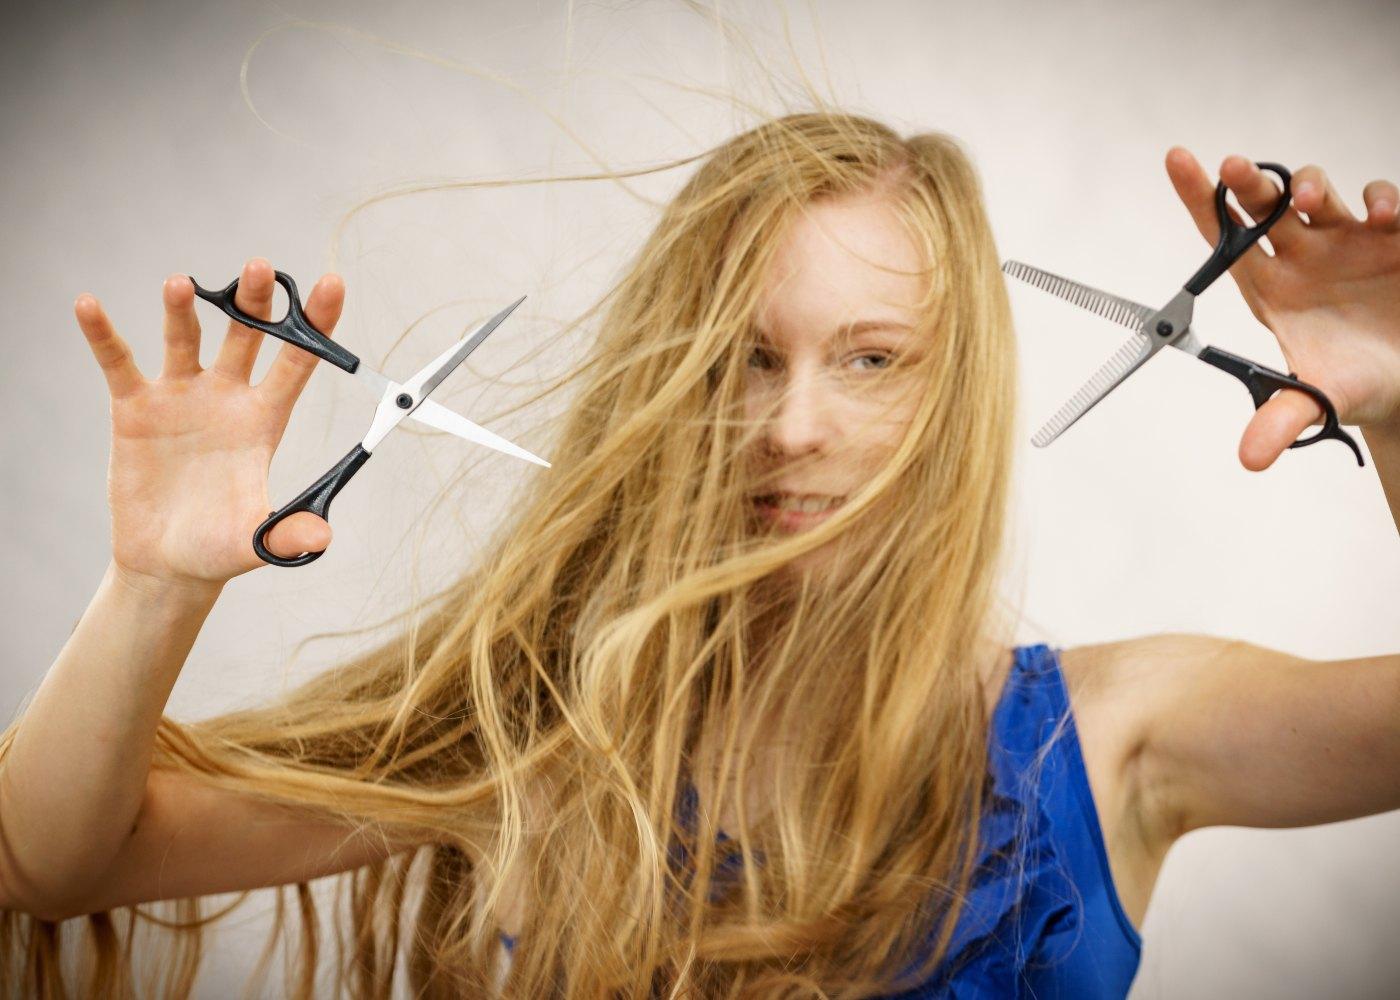 Mulher prestes a cortar o cabelo